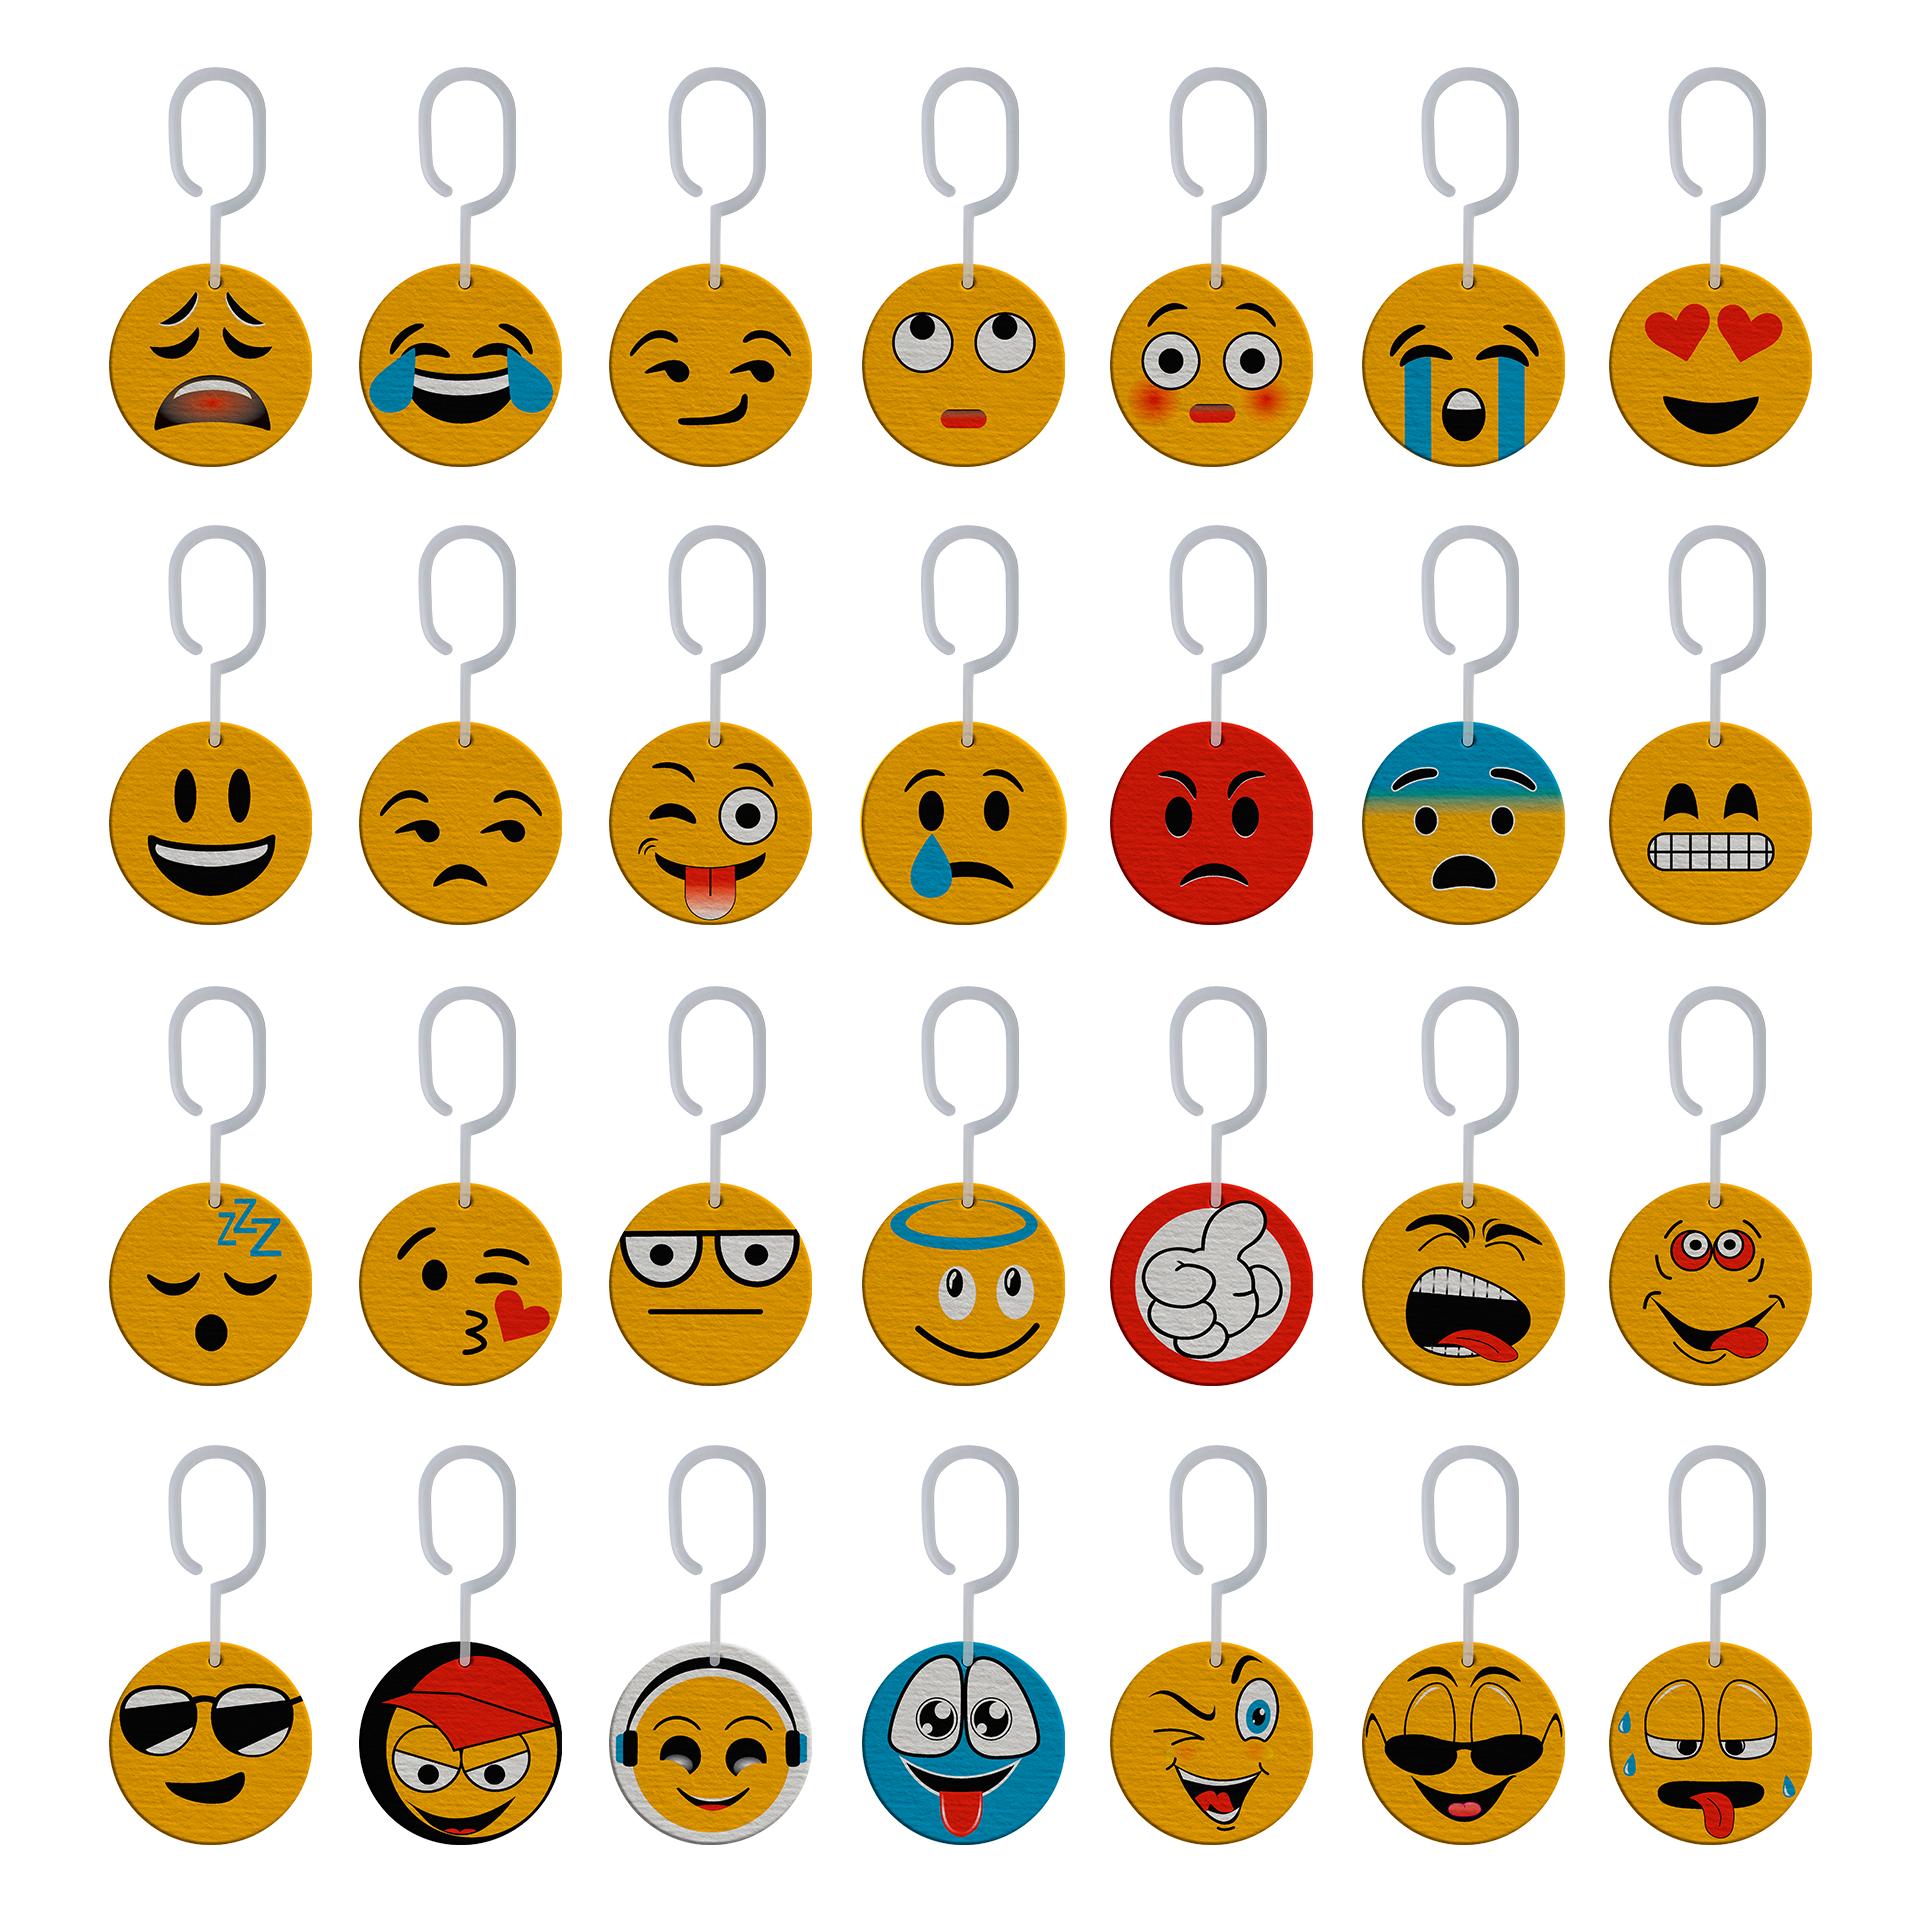 28 Frentes con Caritas Emojis